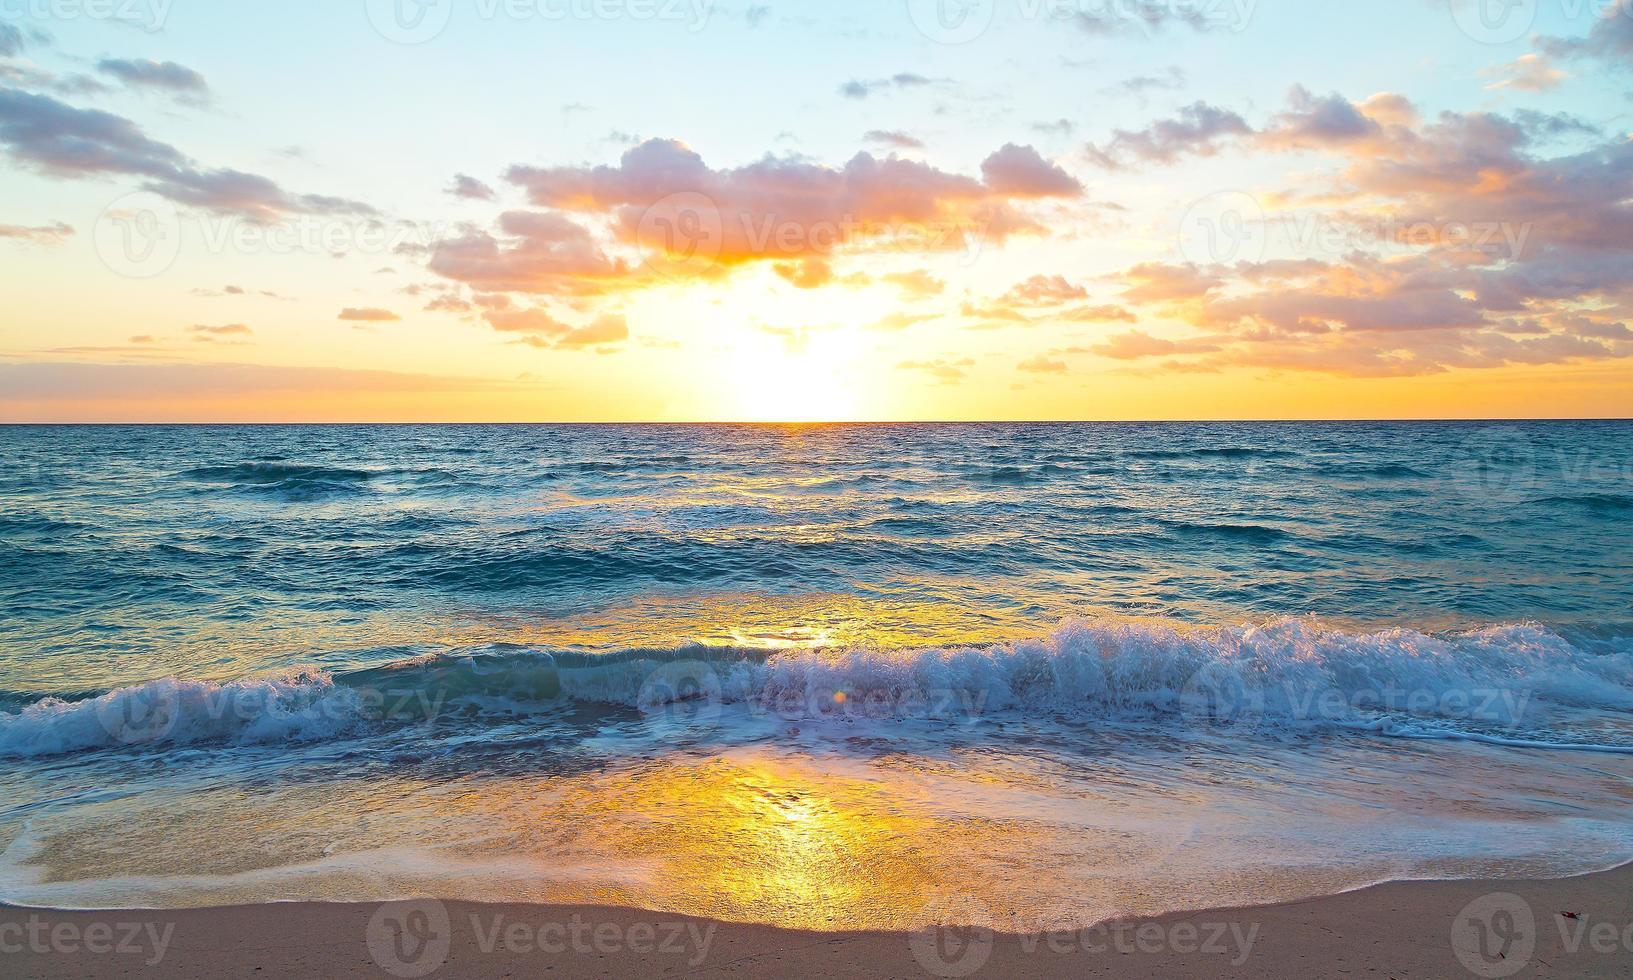 Sunrise over the ocean in Miami Beach, Florida. photo